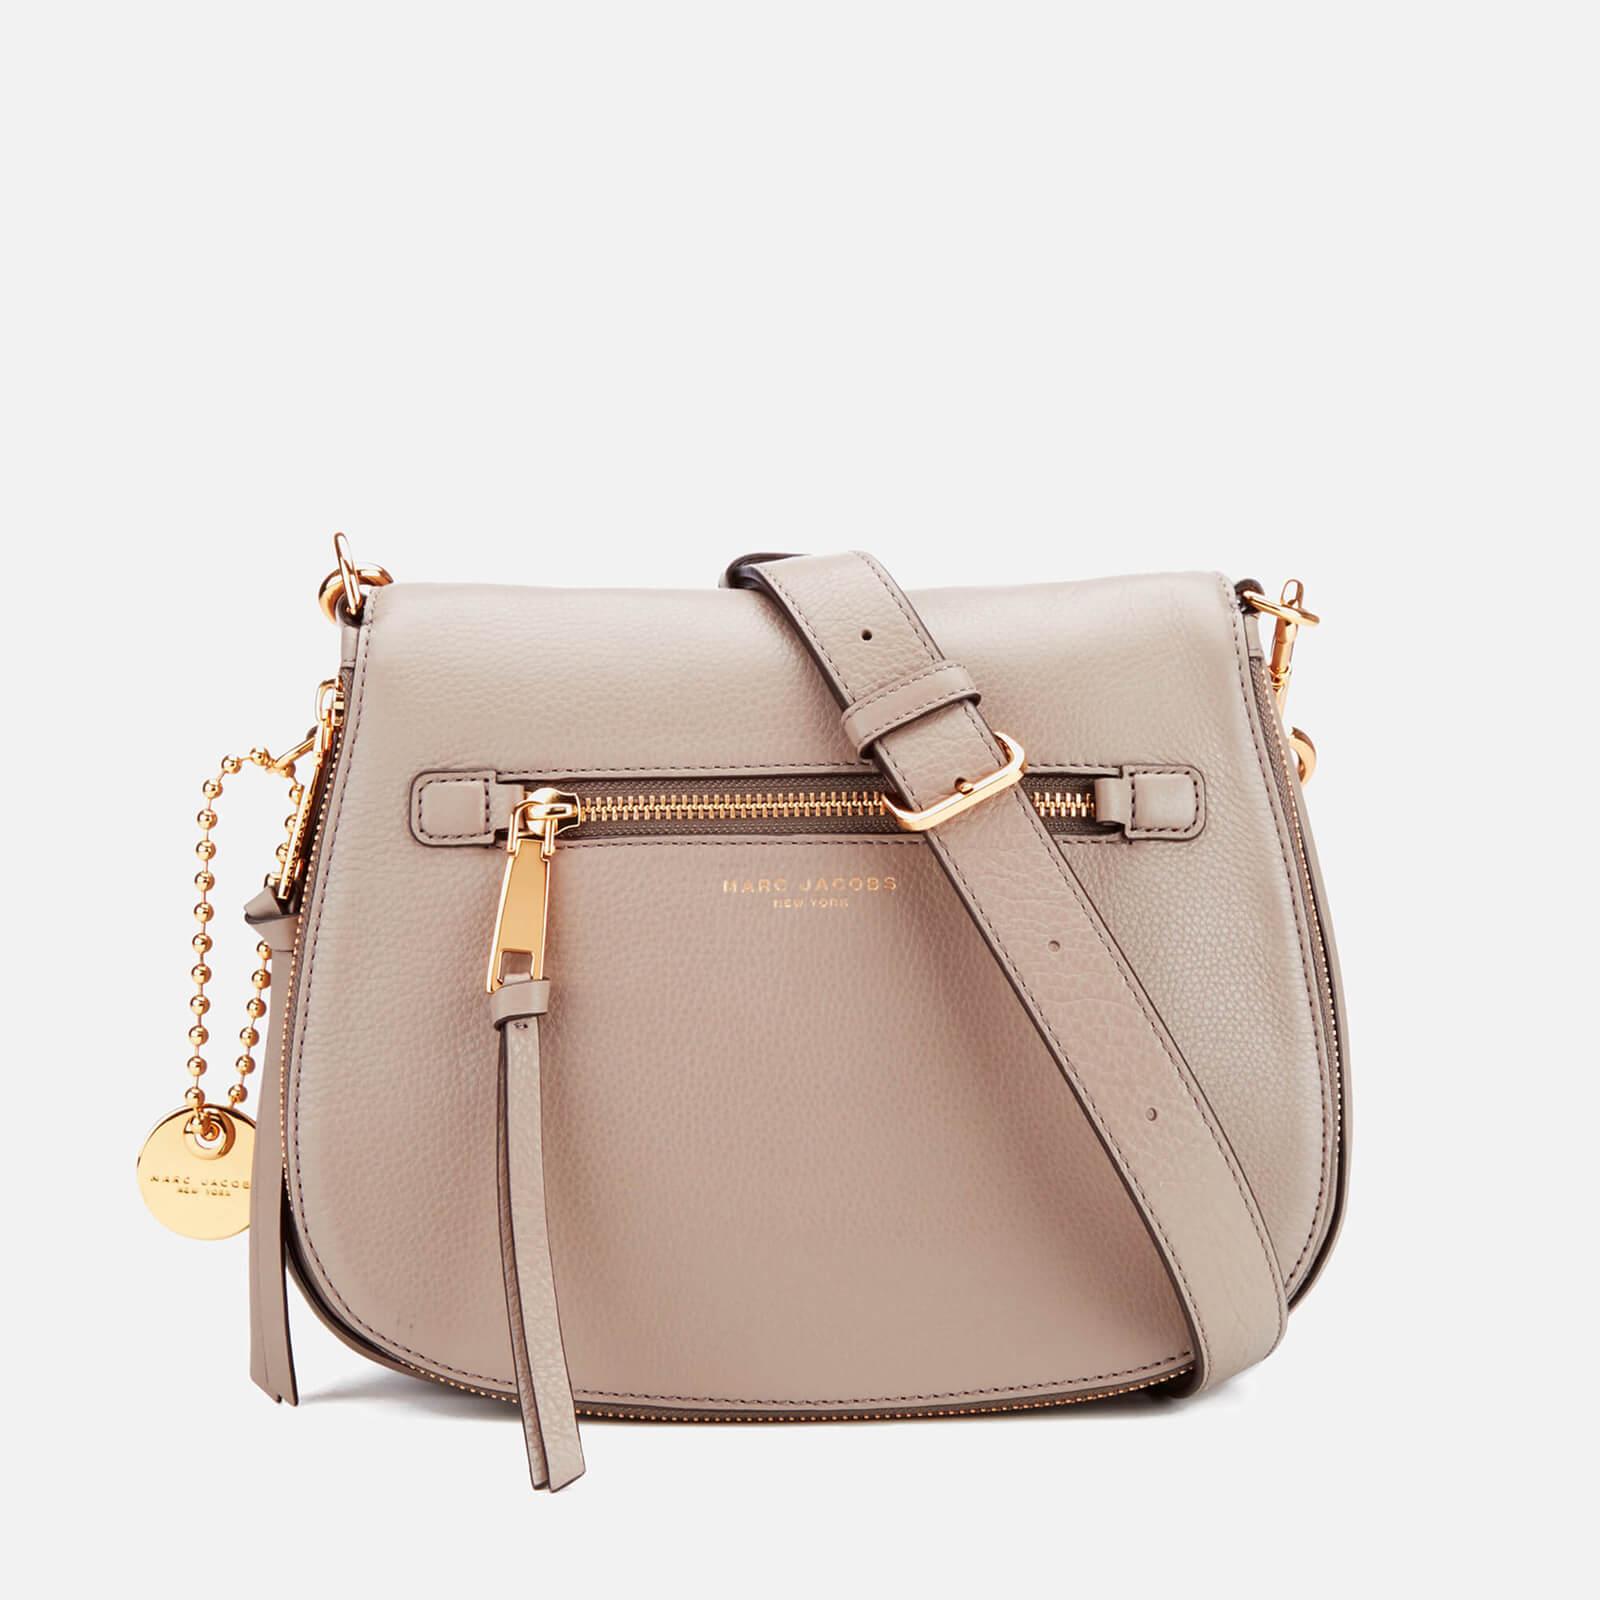 2d2169ff2d7b Marc Jacobs Women s Recruit Saddle Bag - Mink - Free UK Delivery ...